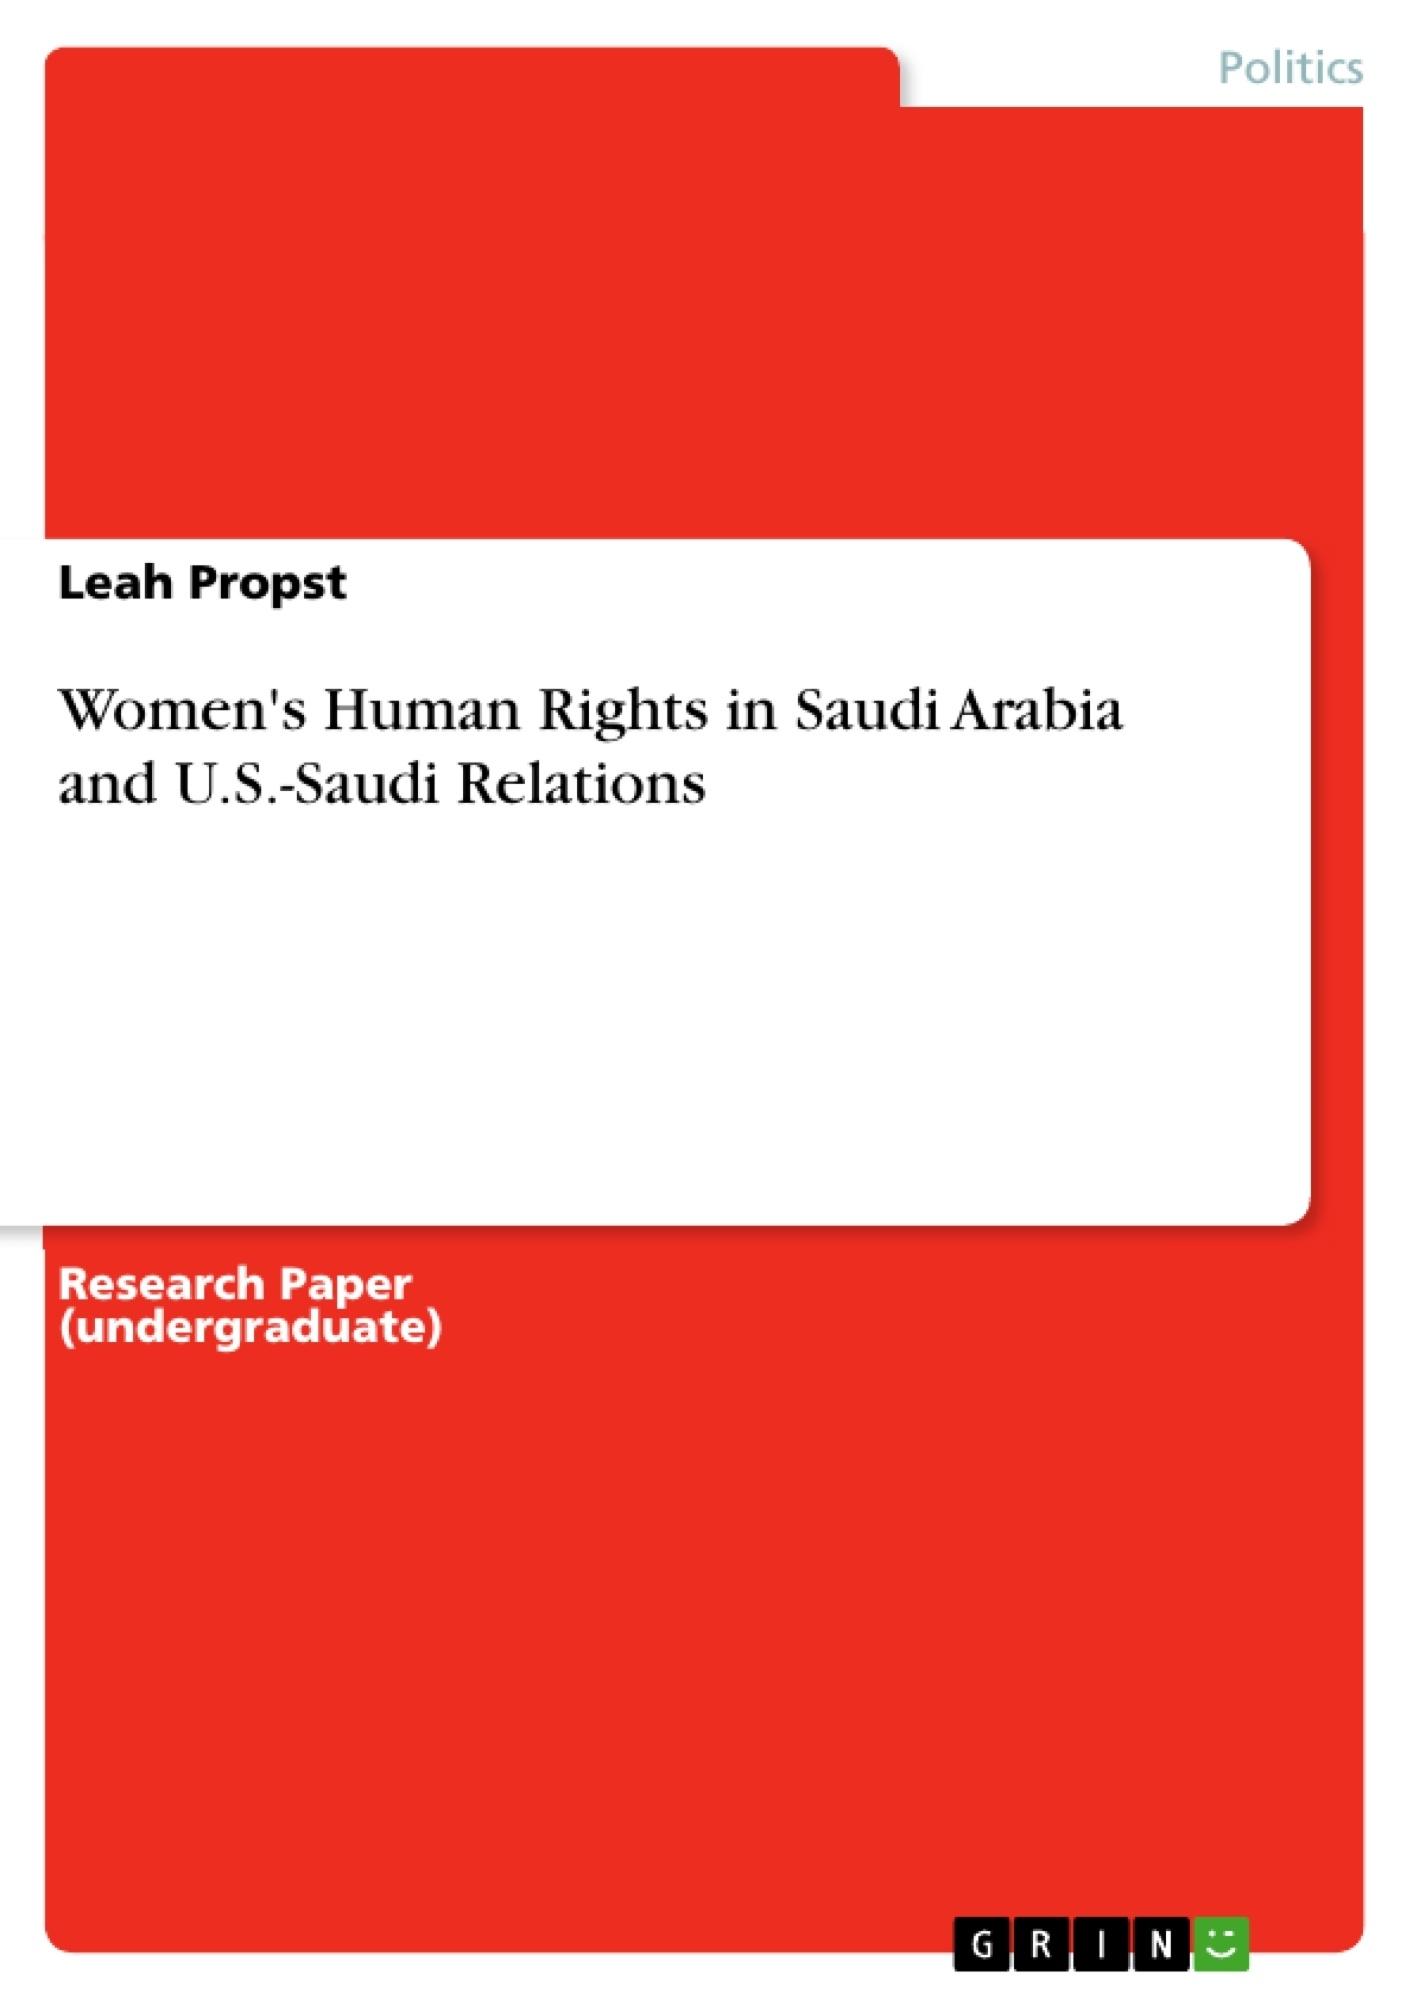 Title: Women's Human Rights in Saudi Arabia and U.S.-Saudi Relations